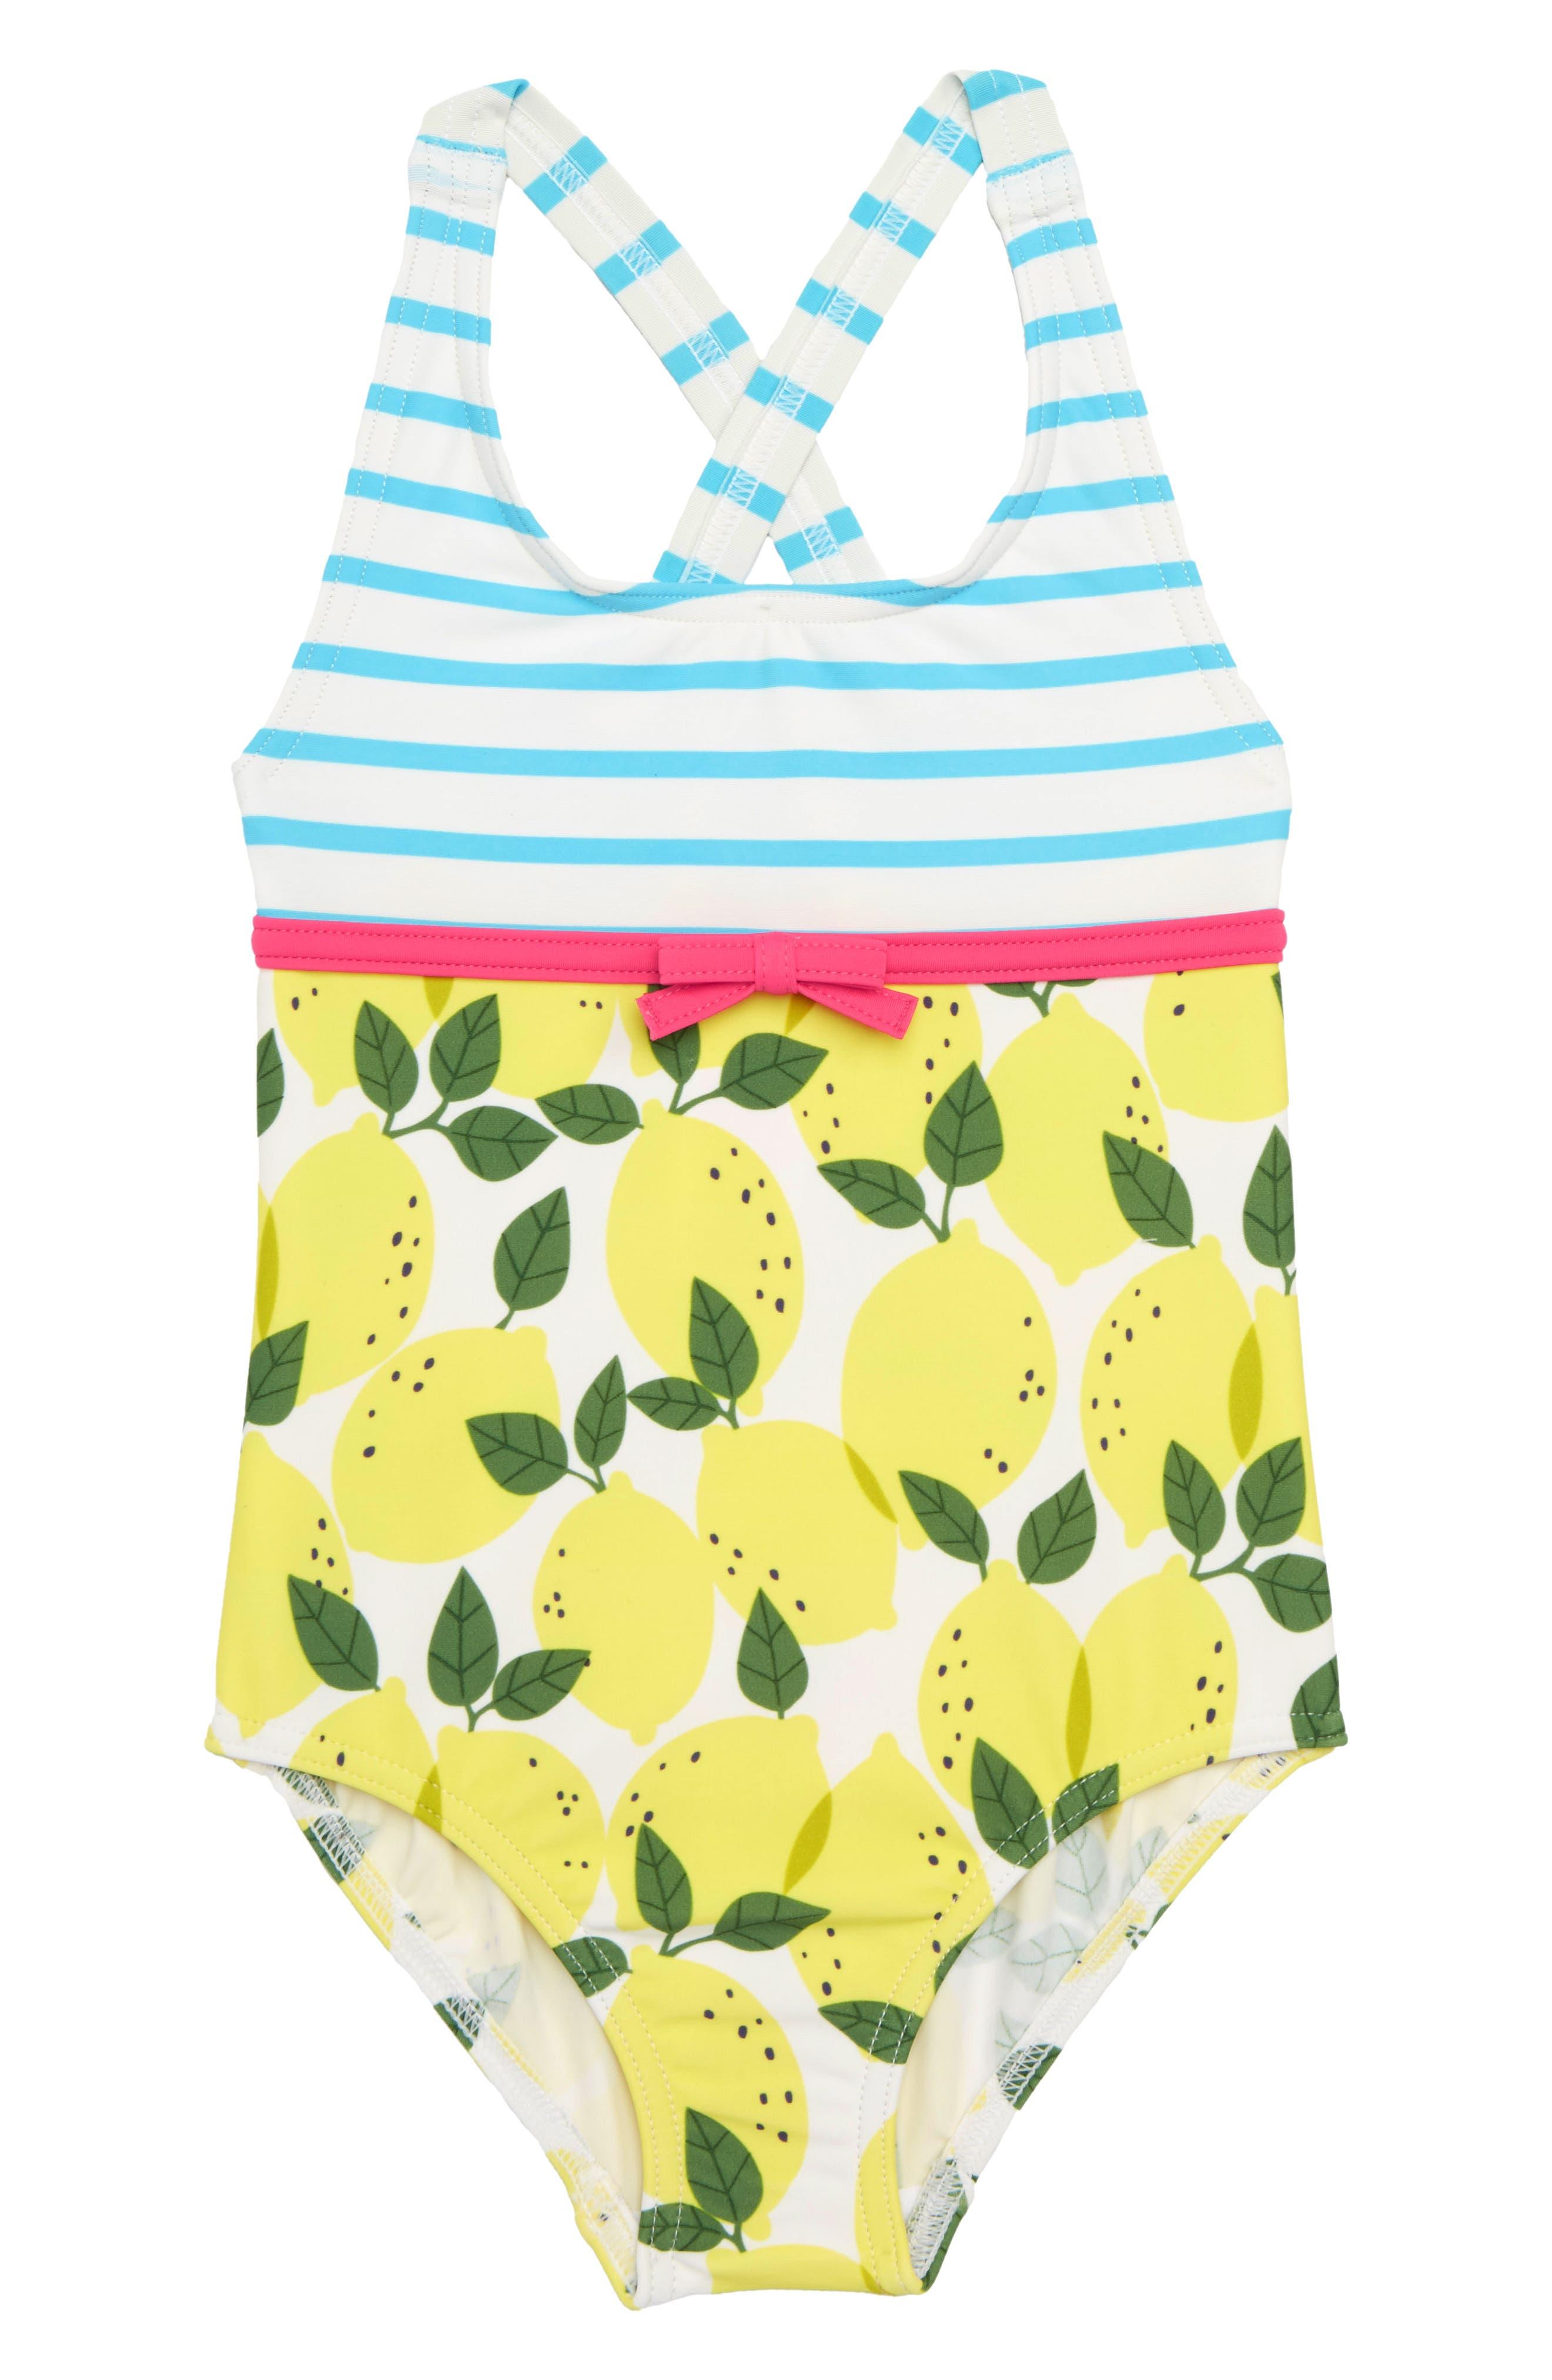 Hotchpotch One-Piece Swimsuit,                             Main thumbnail 1, color,                             Ivory Lemon Tree Yel